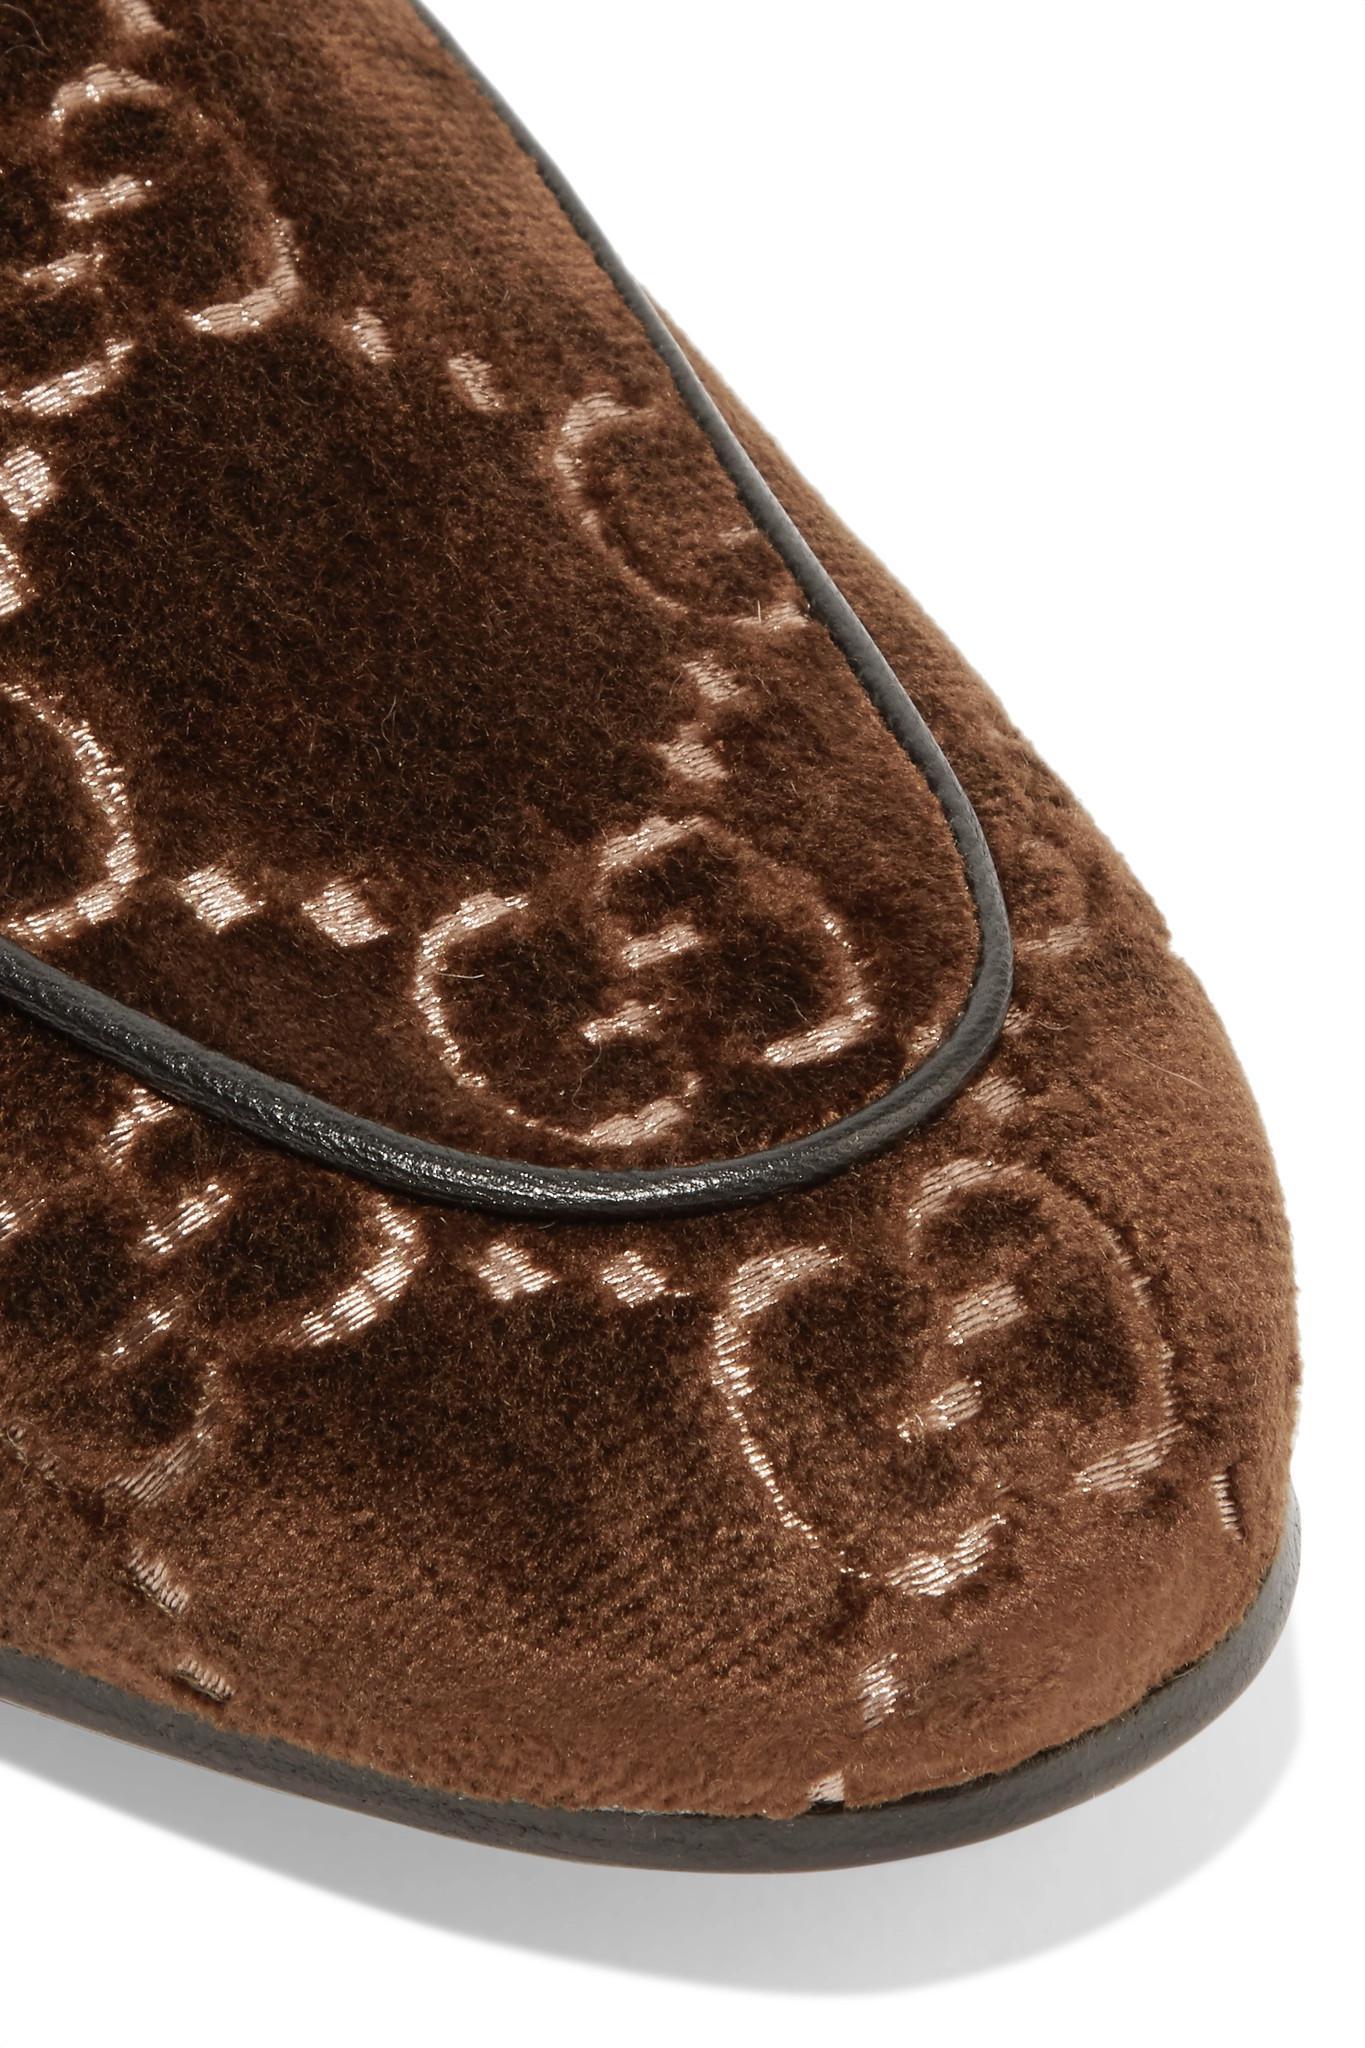 adf602a9ba4 ... Horsebit-detailed Shearling-lined Logo-jacquard Slippers - Lyst. View  fullscreen